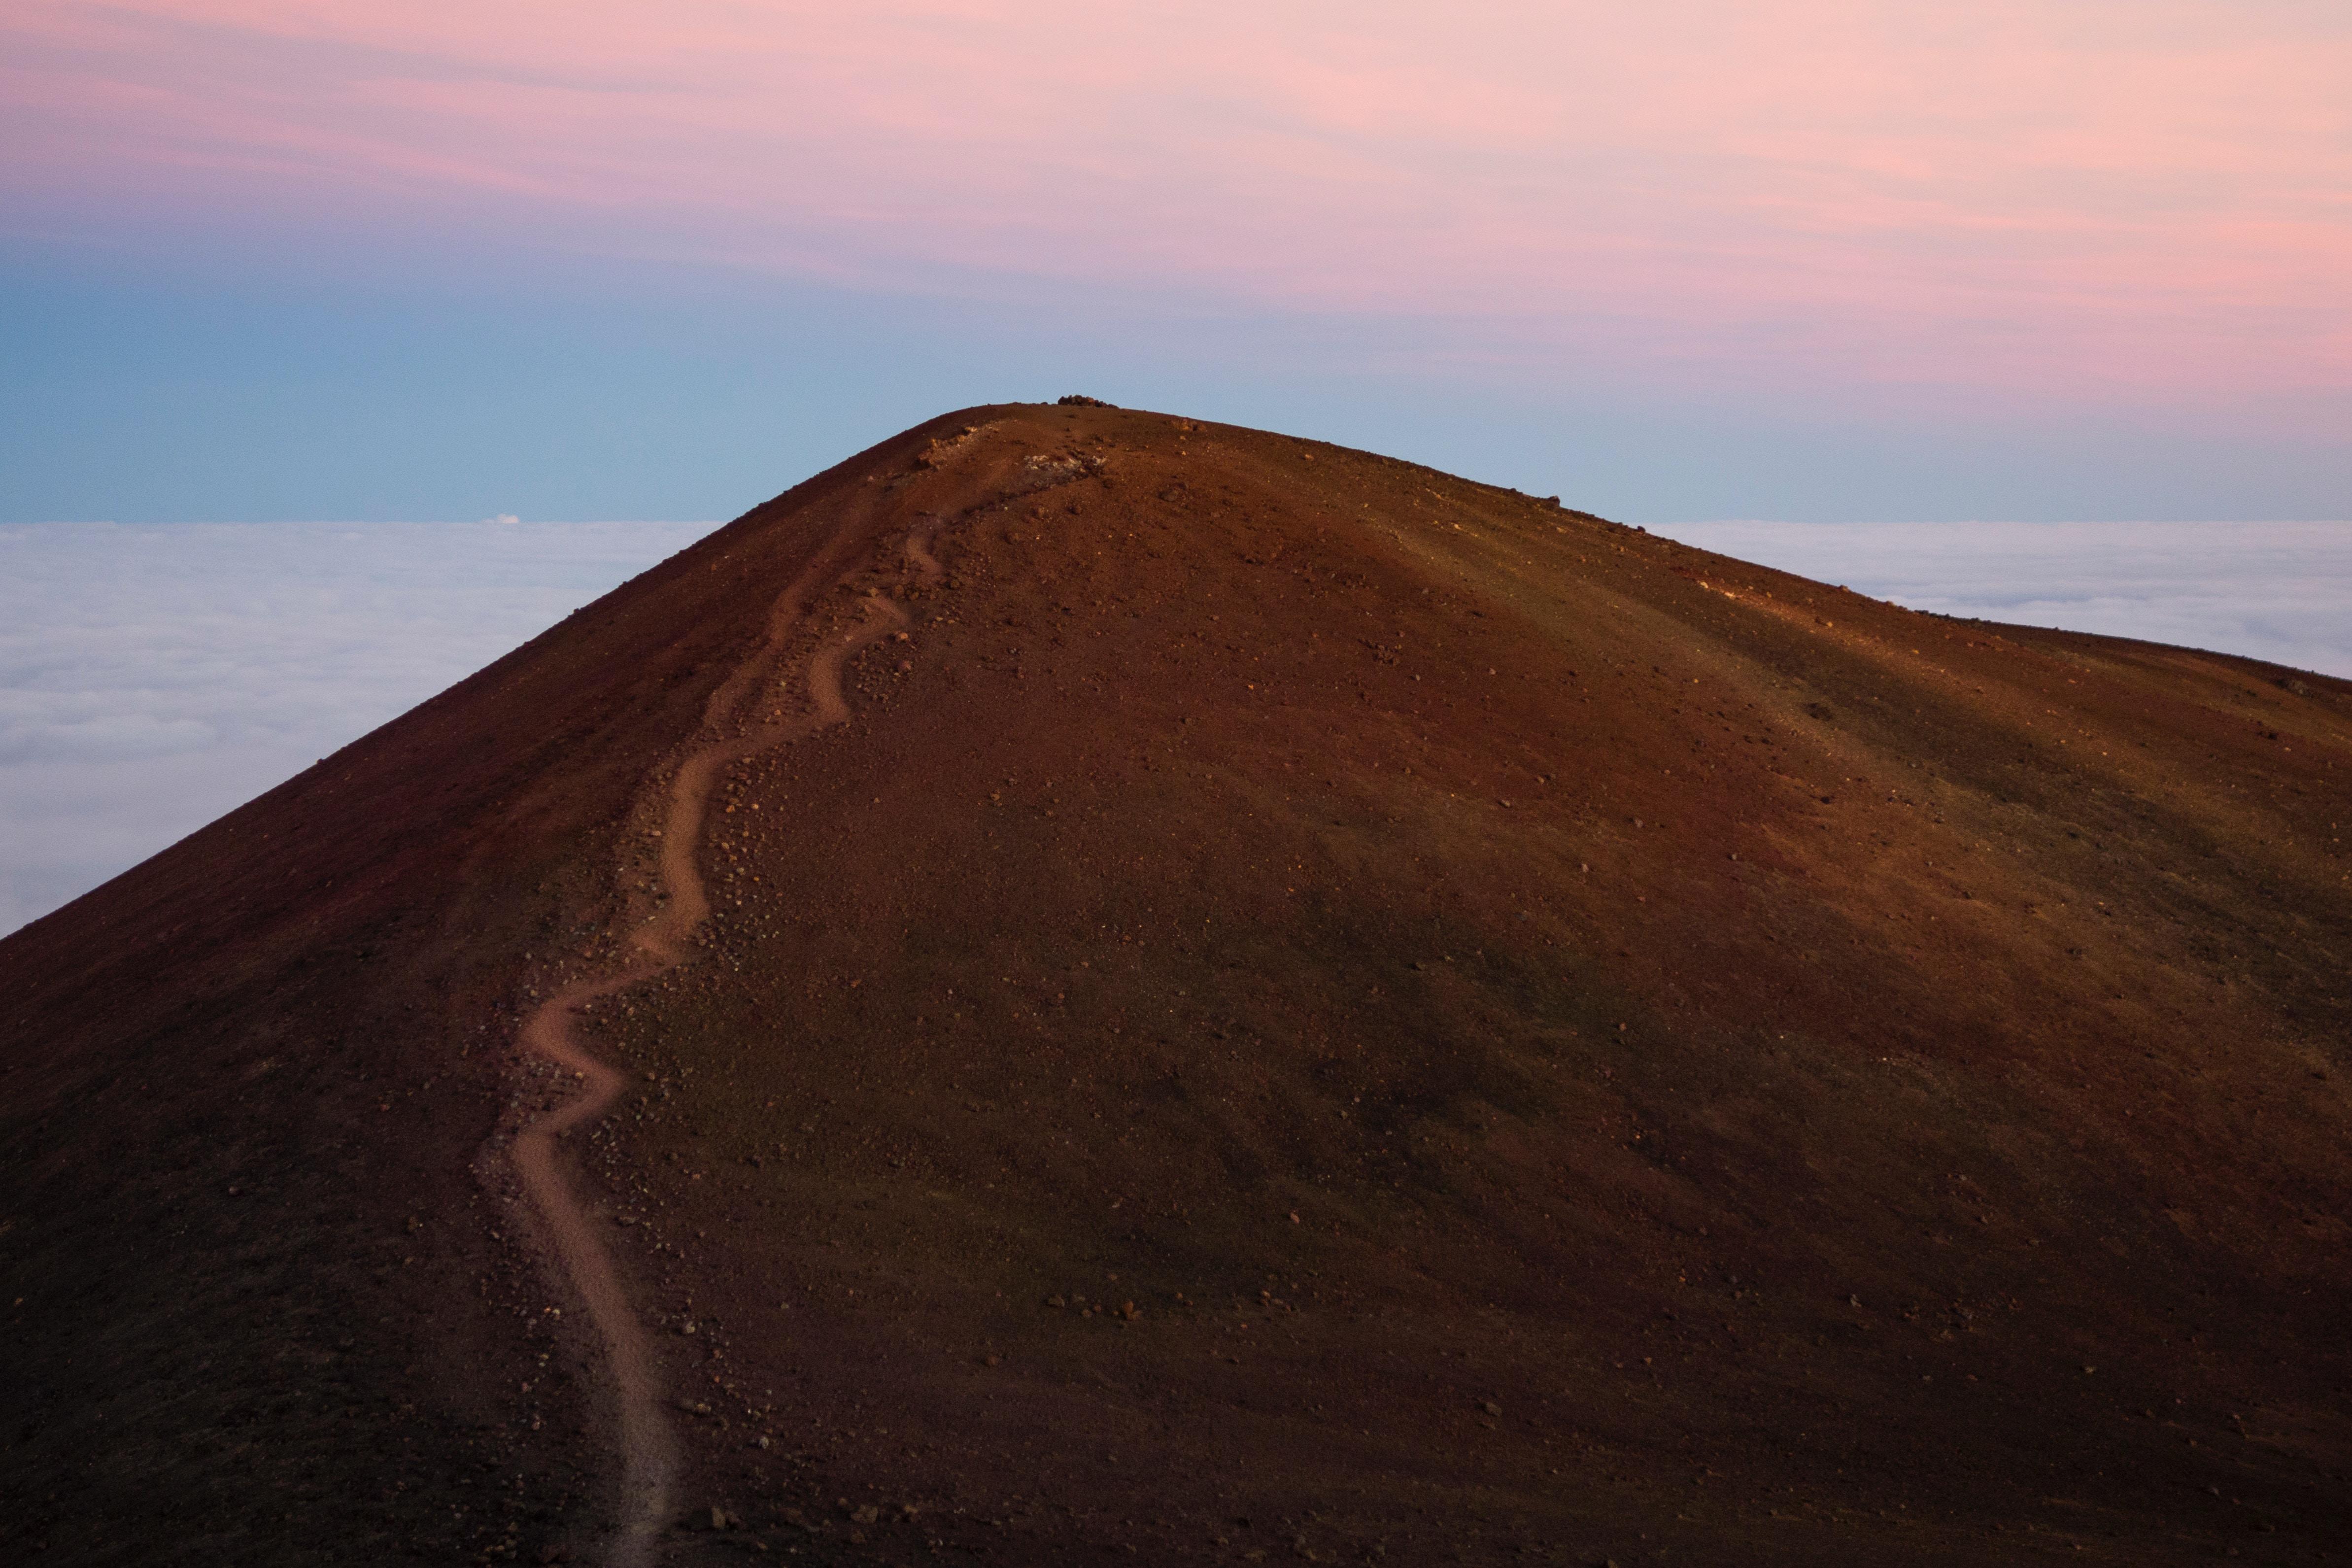 Walking trail up a hill